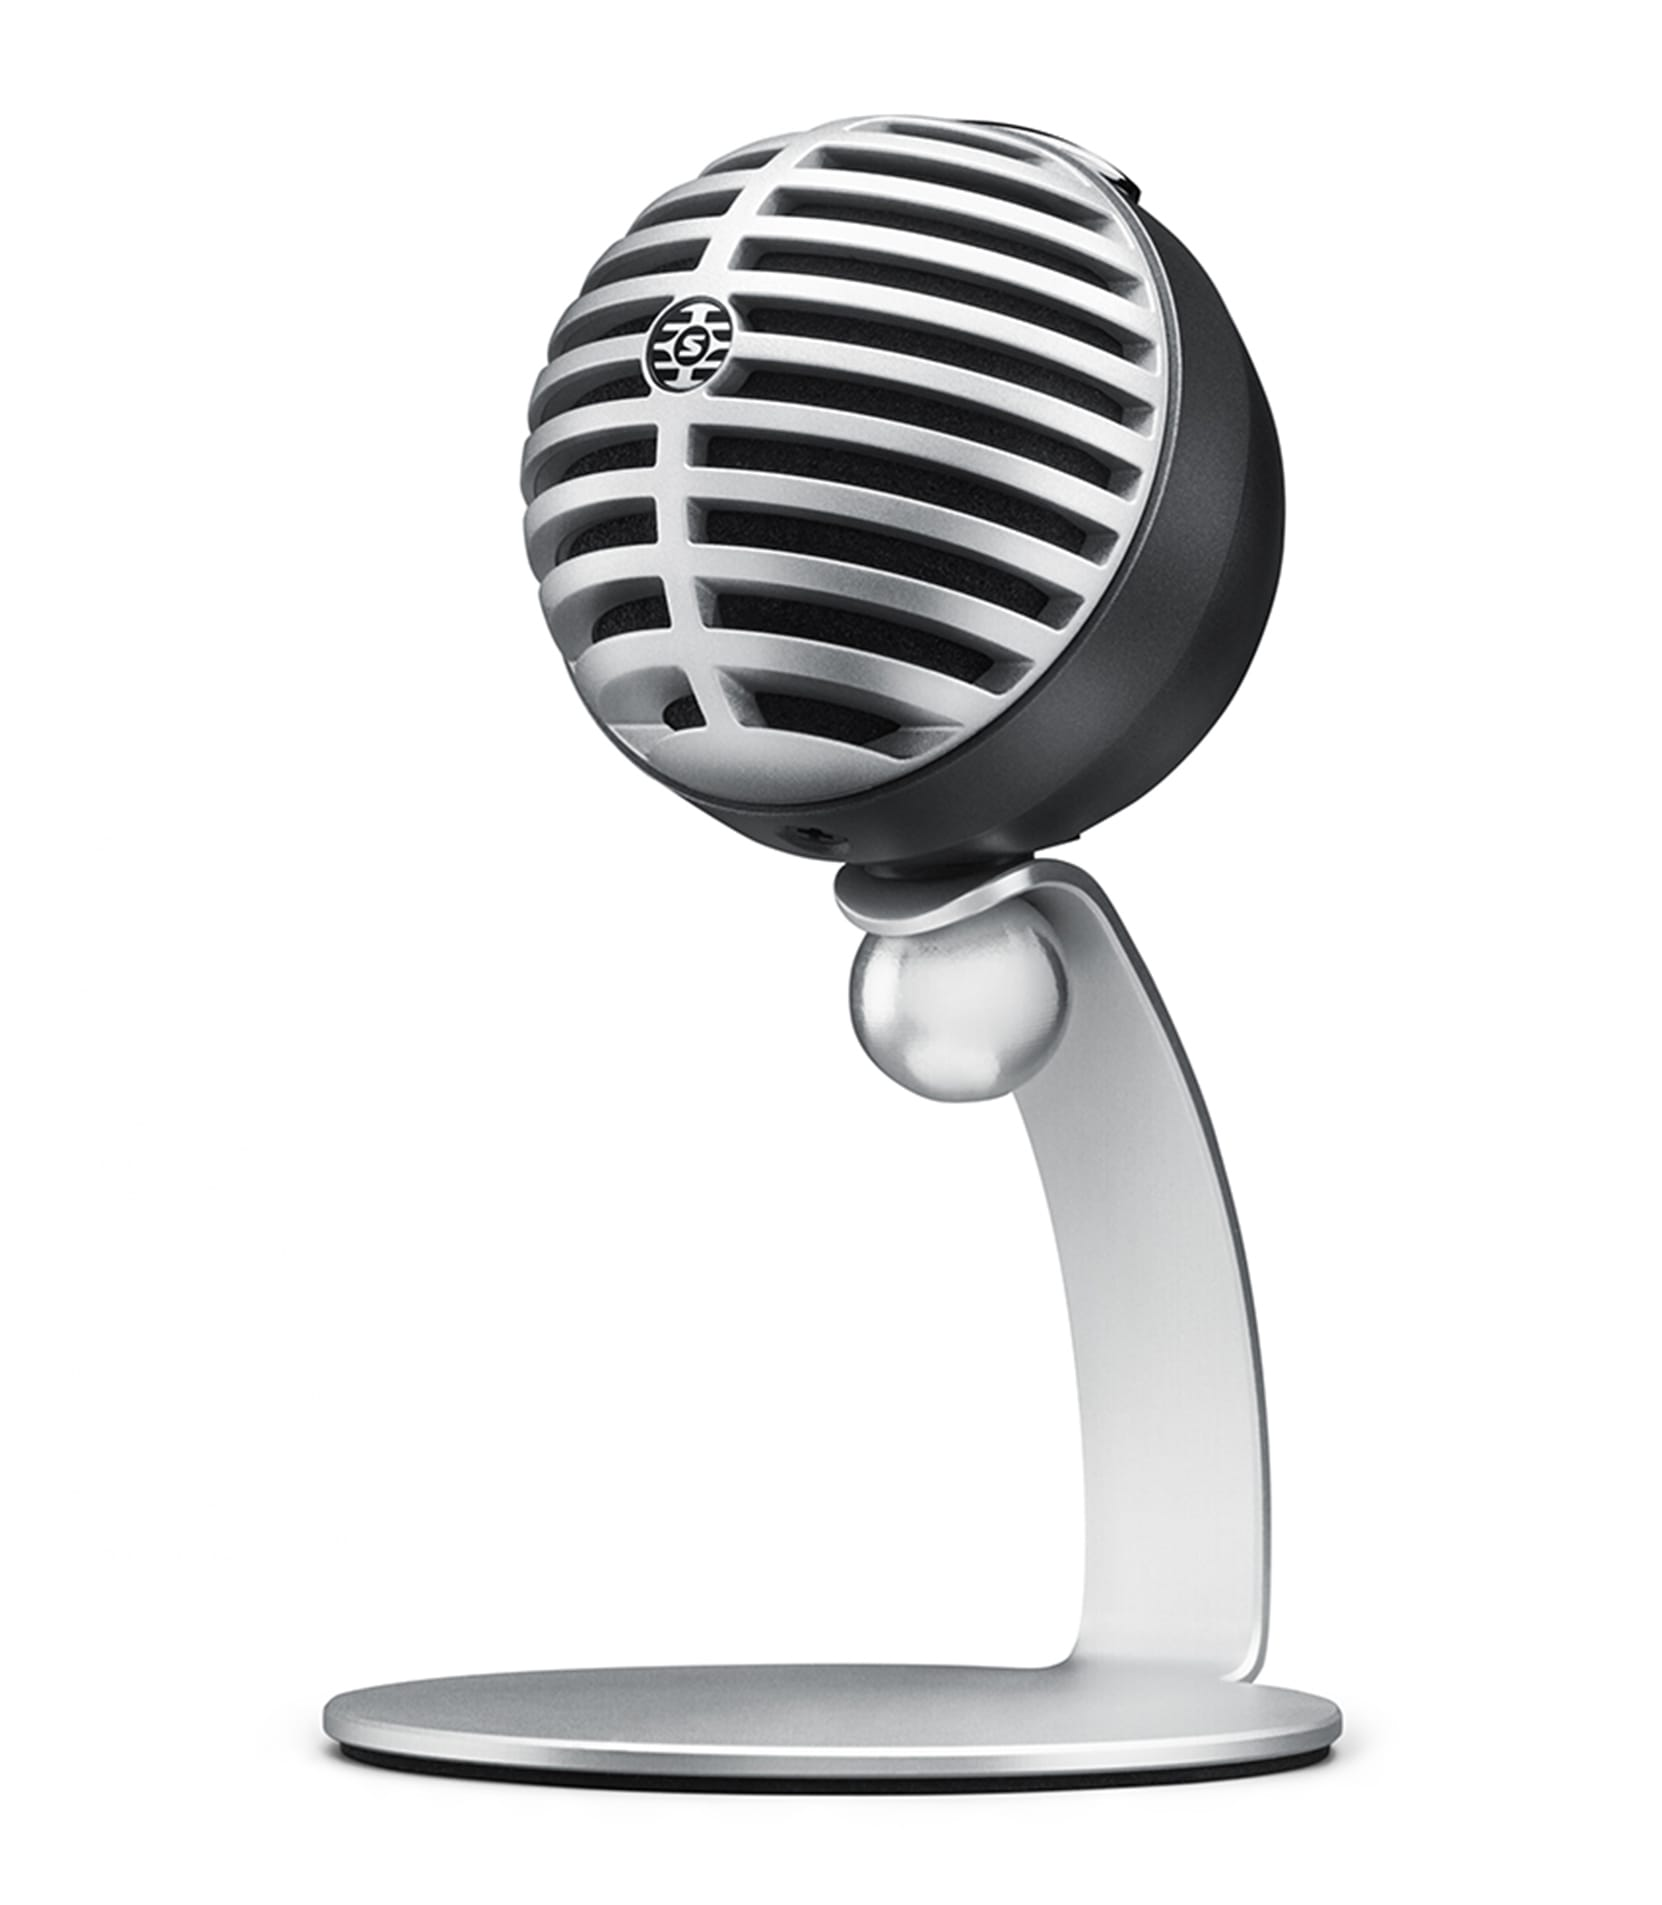 Buy shure MV5 LTG Digital condenser microphone Grey Melody House